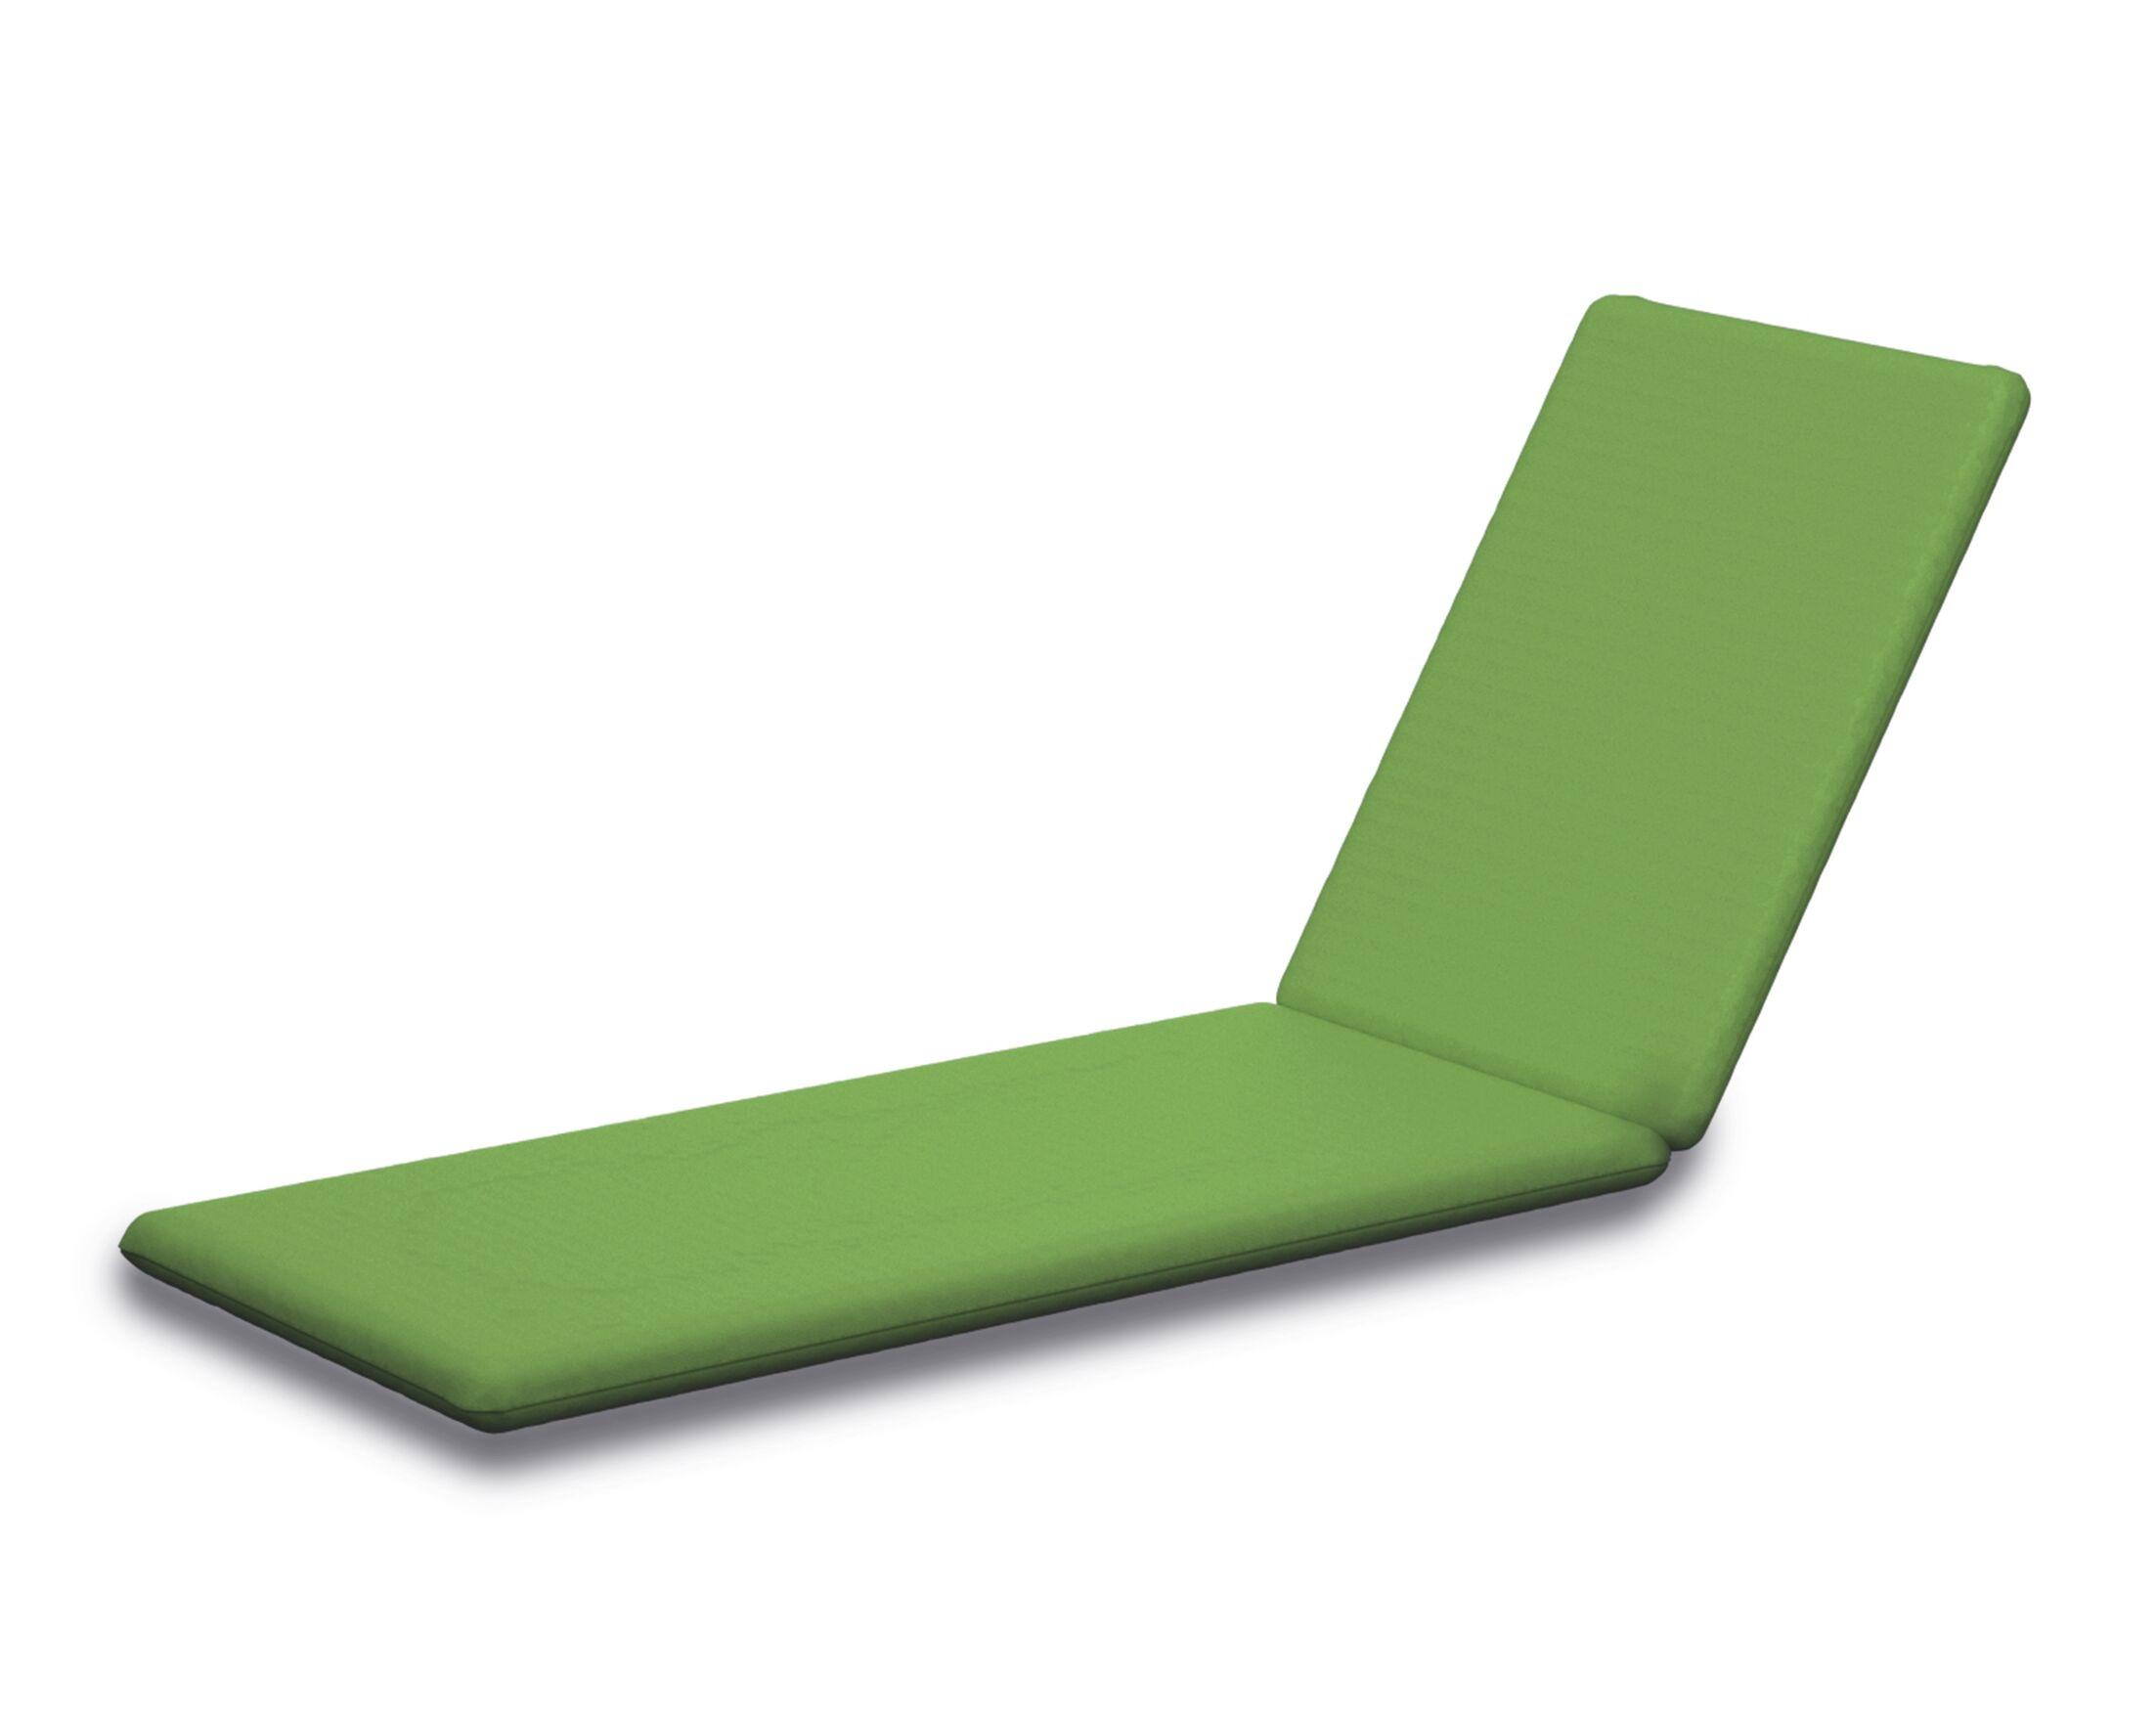 Indoor/Outdoor Sunbrella Chaise Lounge Cushion Fabric: Ginkgo